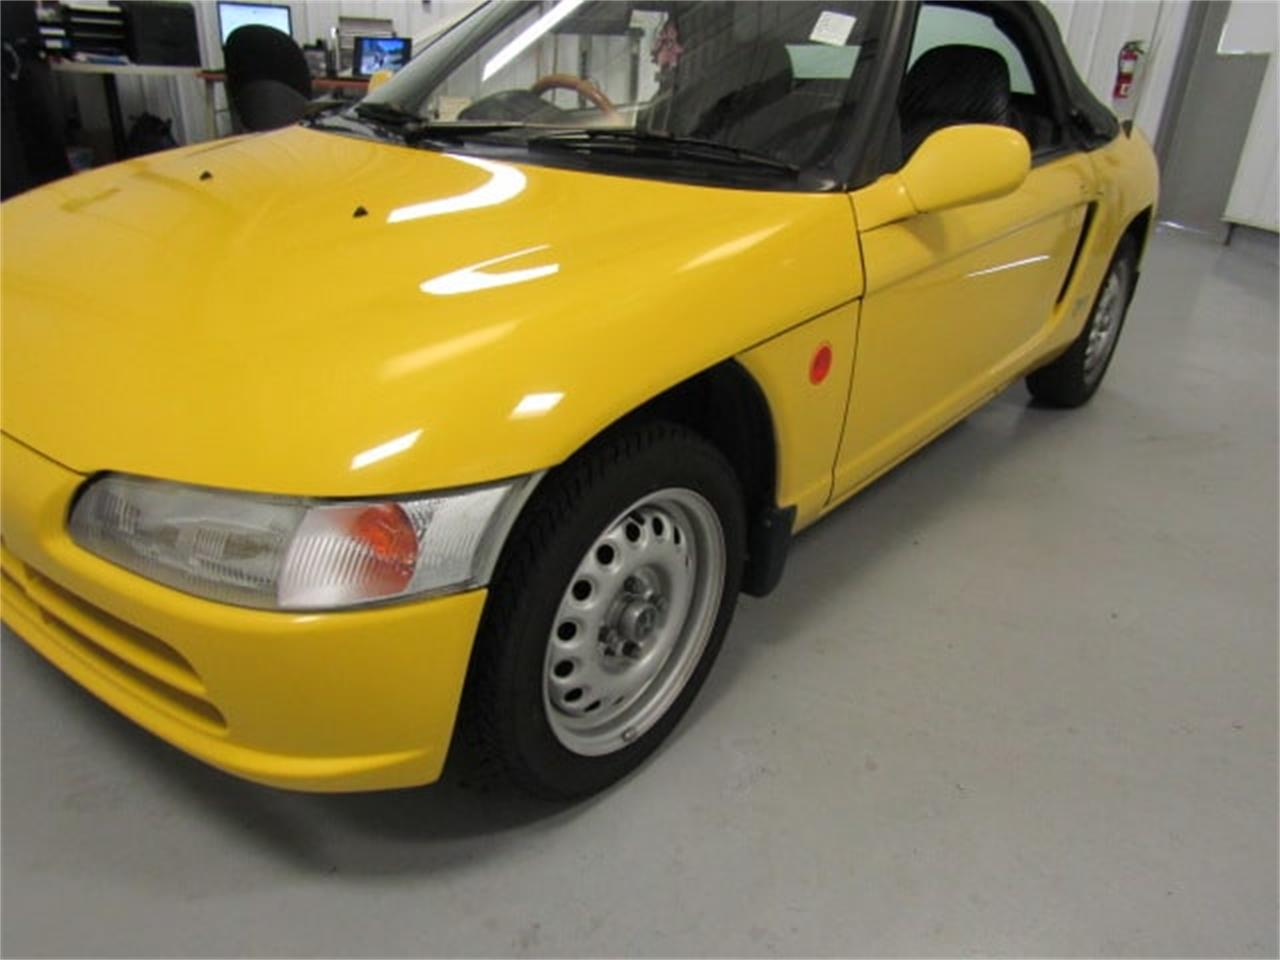 Large Picture of '91 Honda Beat located in Christiansburg Virginia - $4,990.00 - JL81